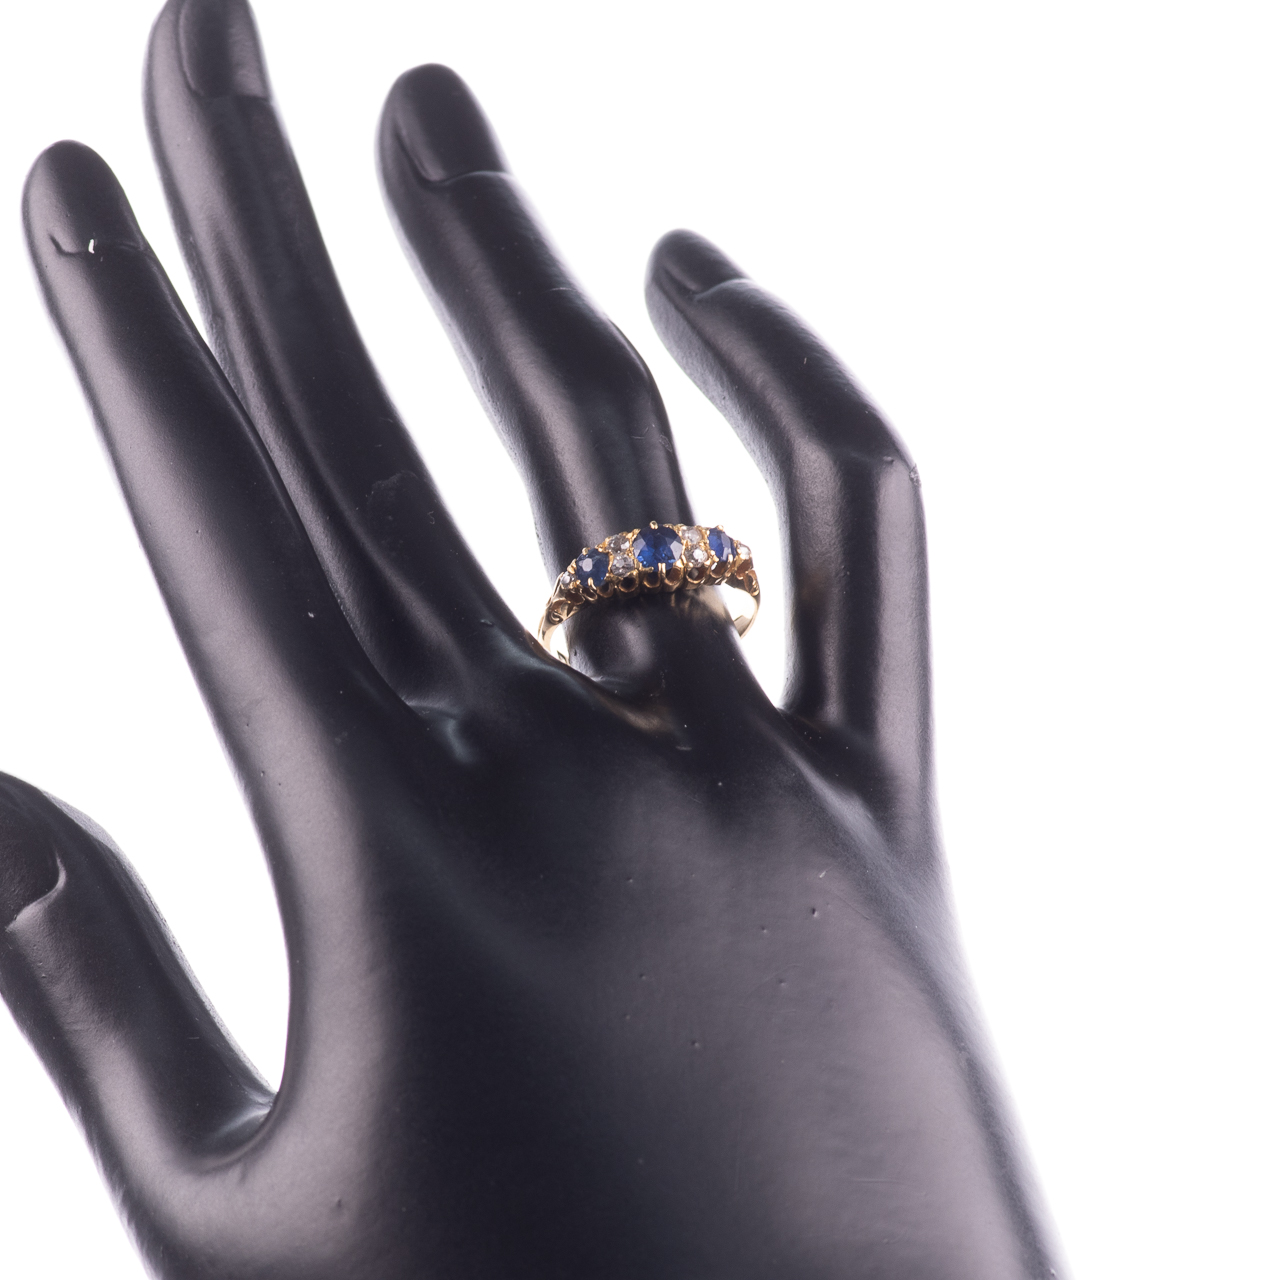 18ct Gold George V 1ct Sapphire & Diamond Ring London 1908 - Image 2 of 7